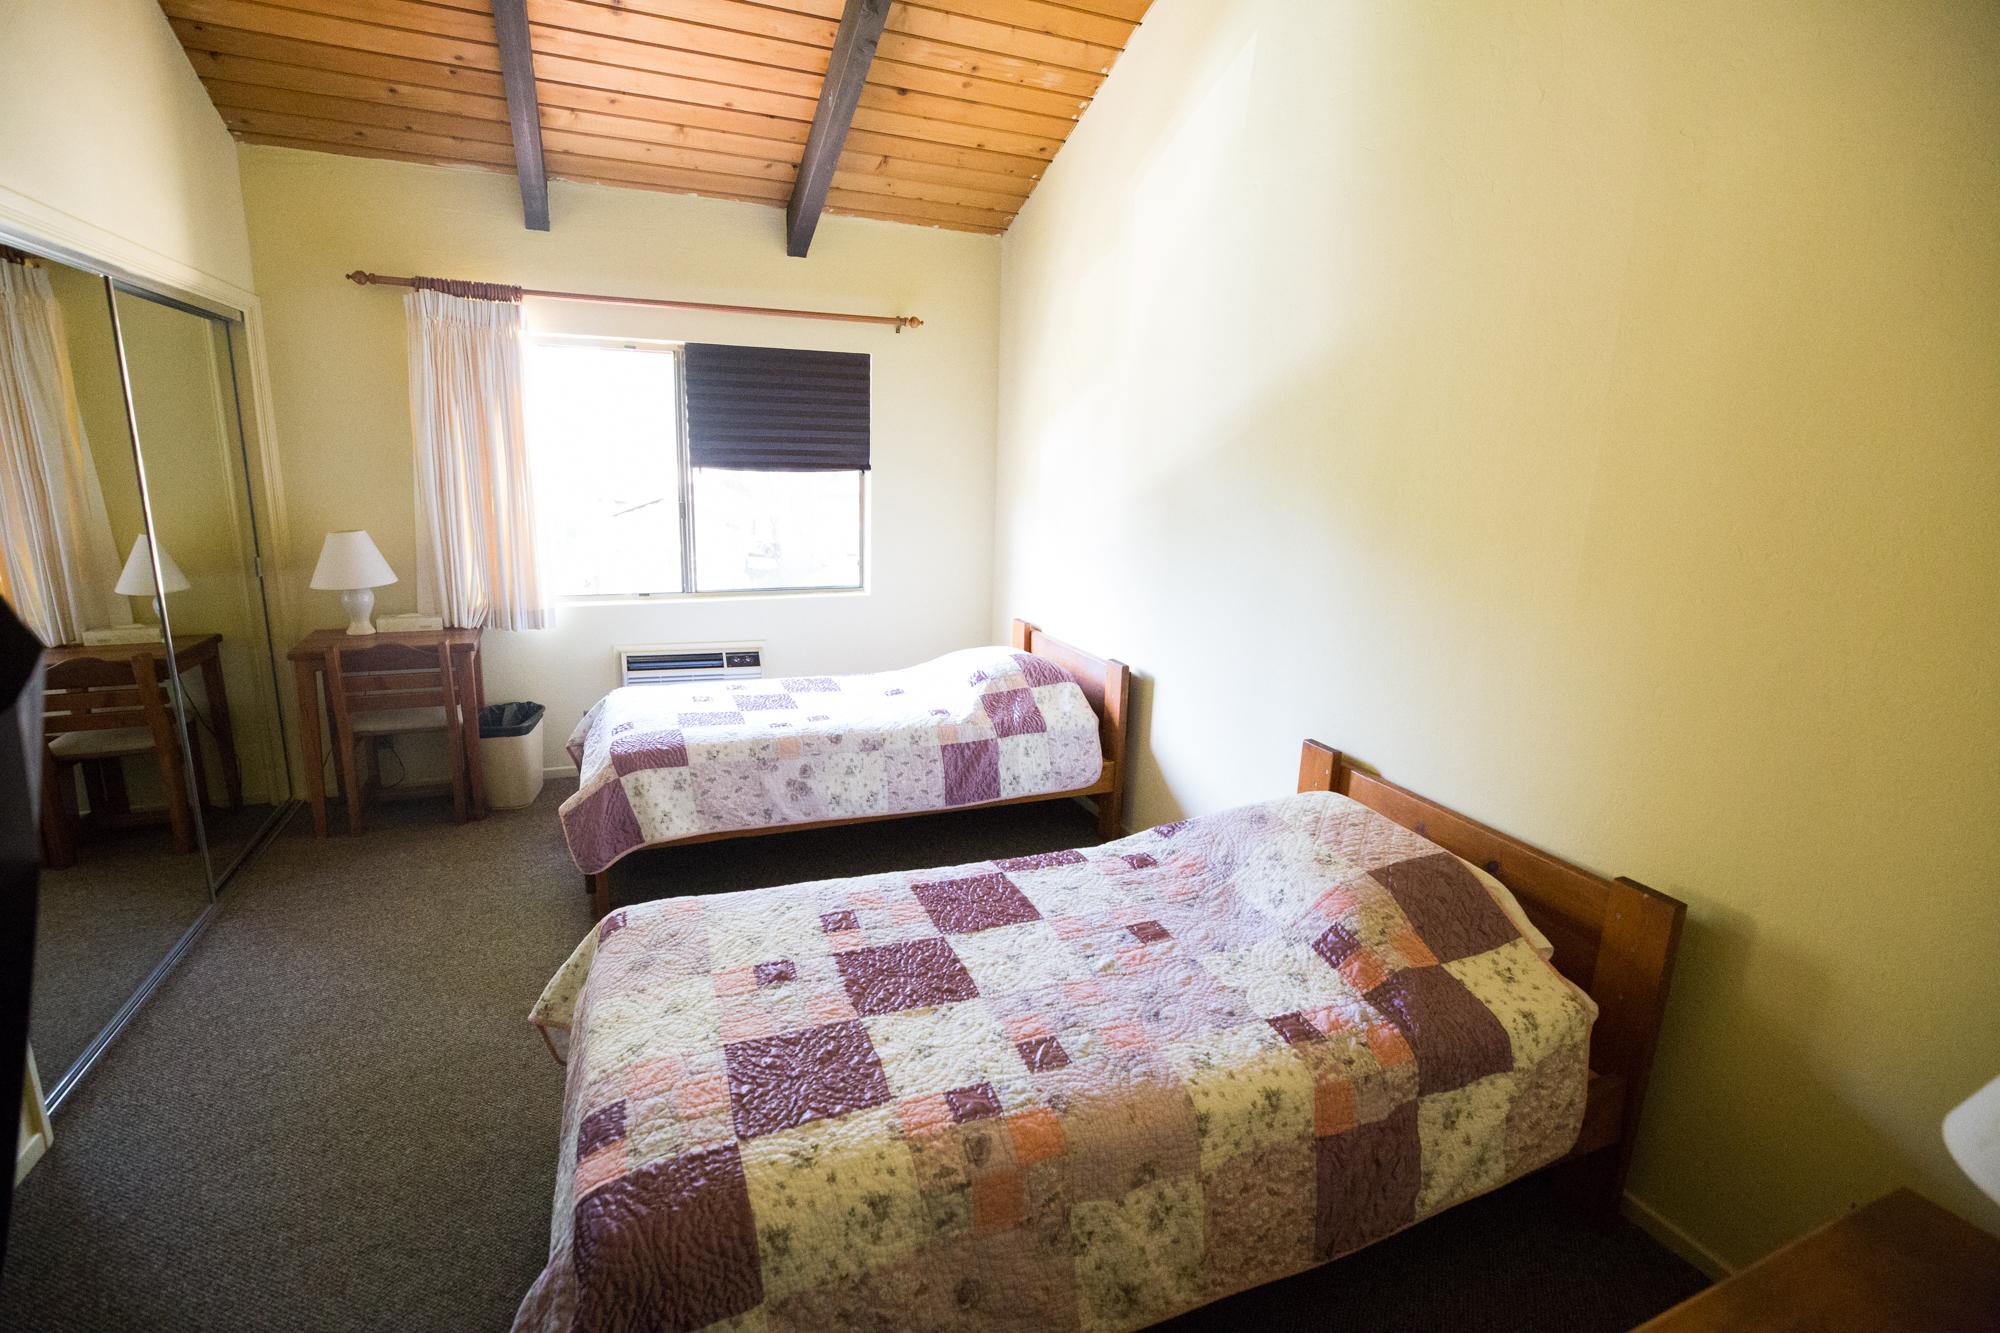 Campus Inn: 2 Bed Room